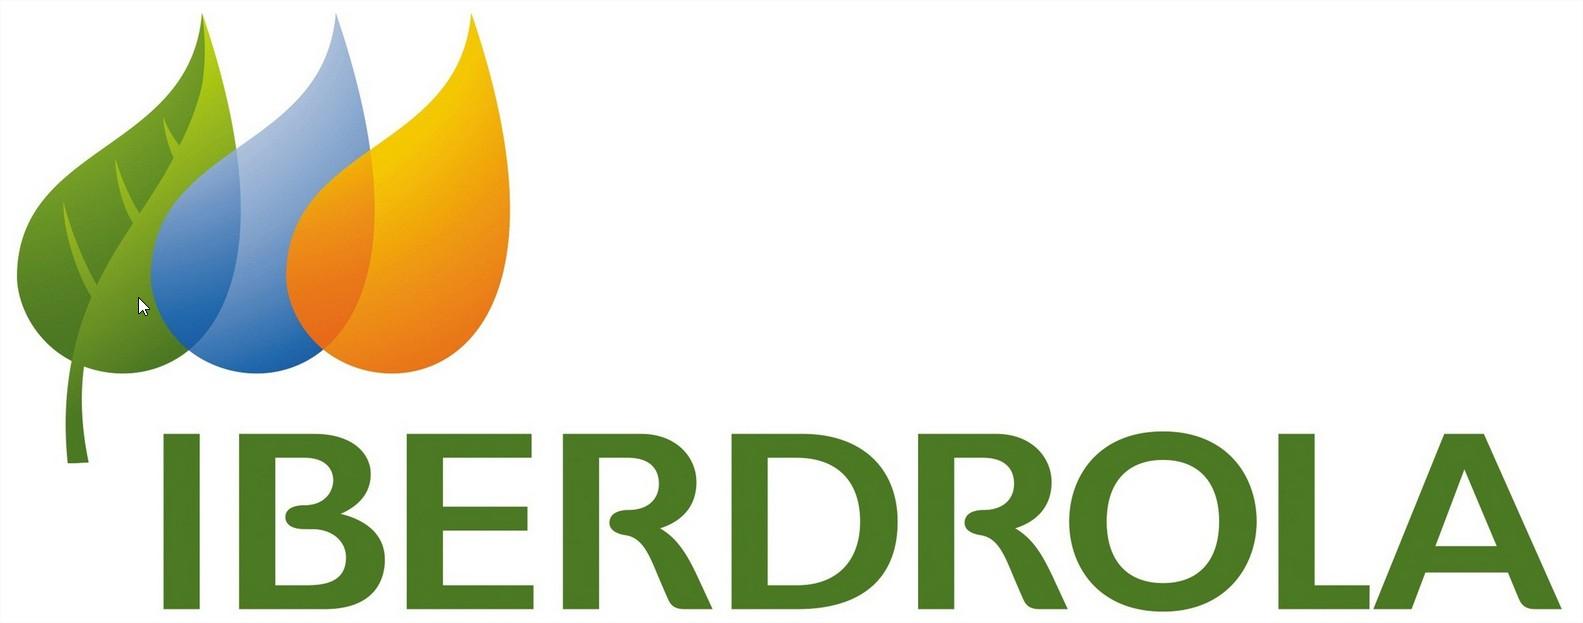 logo-iberdola.jpg